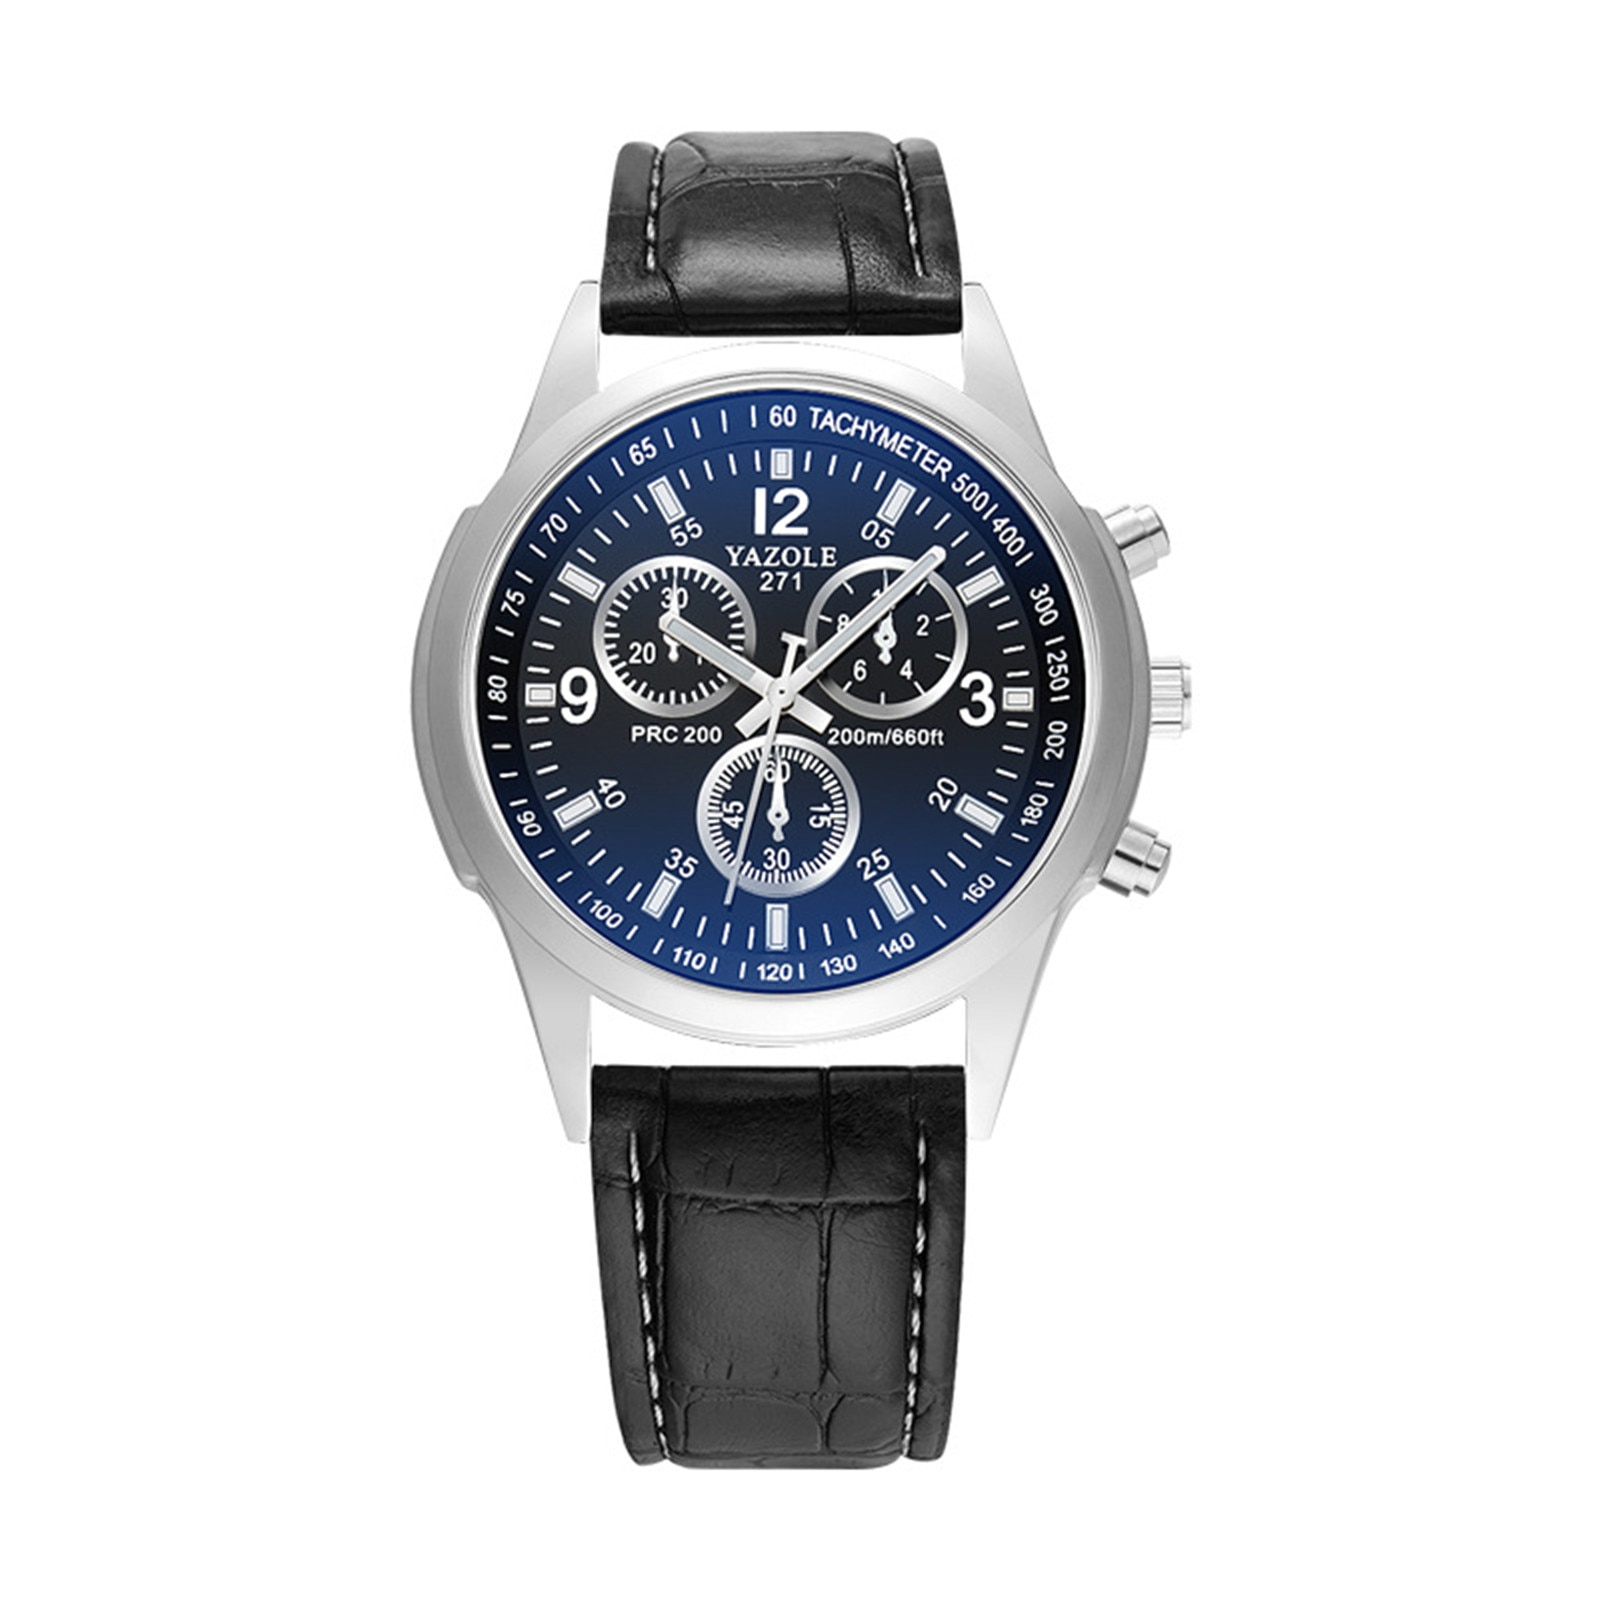 2021 Minimalist Men's Fashion Mens Blu-Ray Roman Numerals Quartz Analog Wrist Watch, Black Band Blac